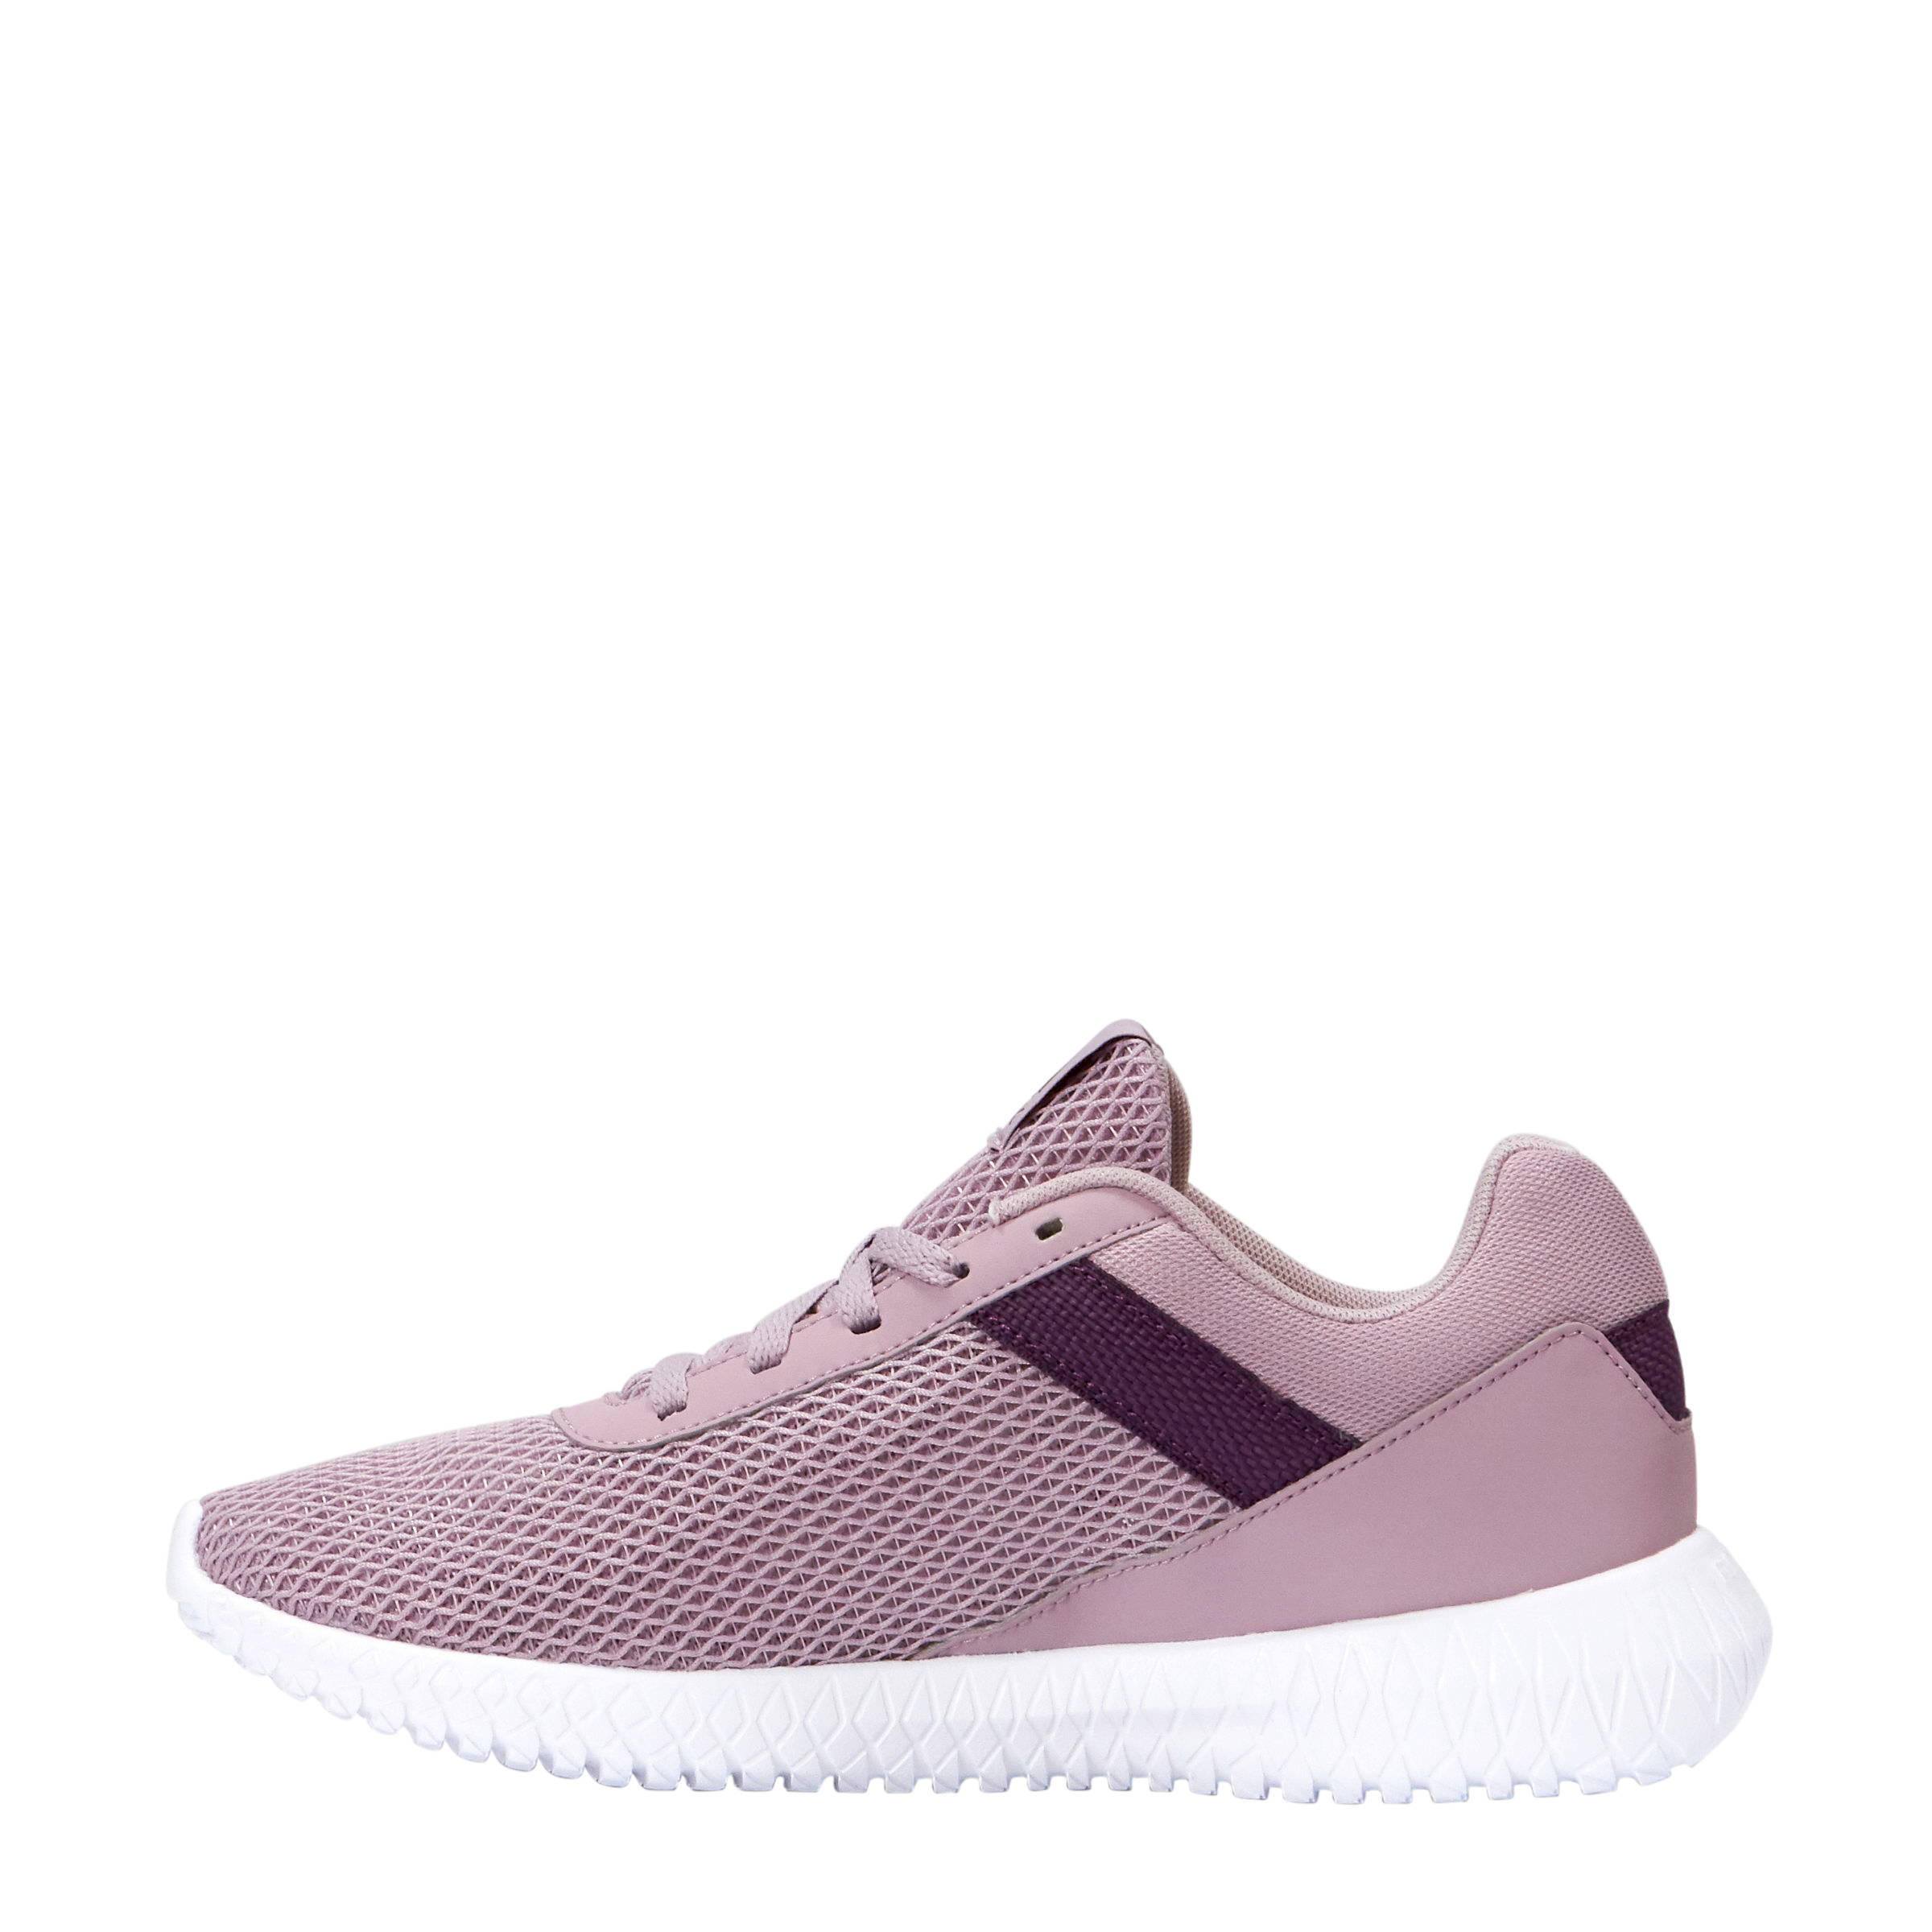 61c811d6cec Reebok Flexagon Fit fitness schoenen lila/paars | wehkamp